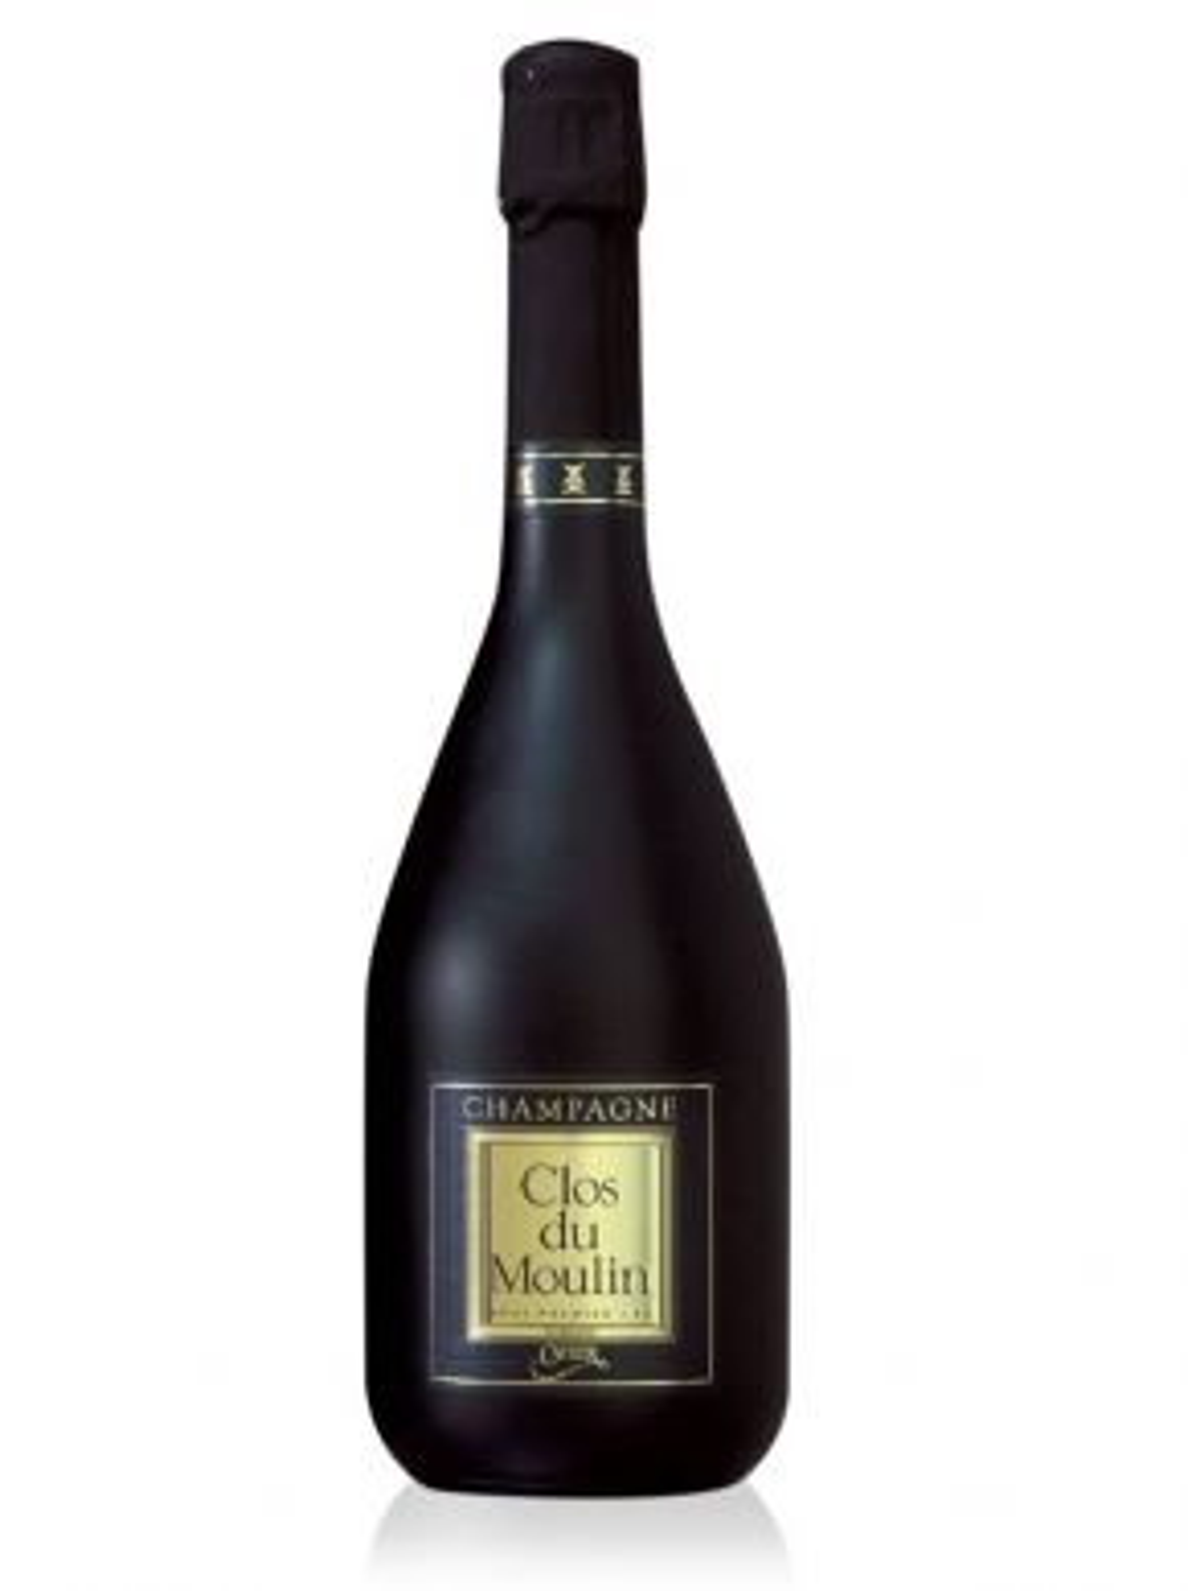 Cattier Premier Cru Clos du Moulin Champagne 2005/06/07 NV Gift Box